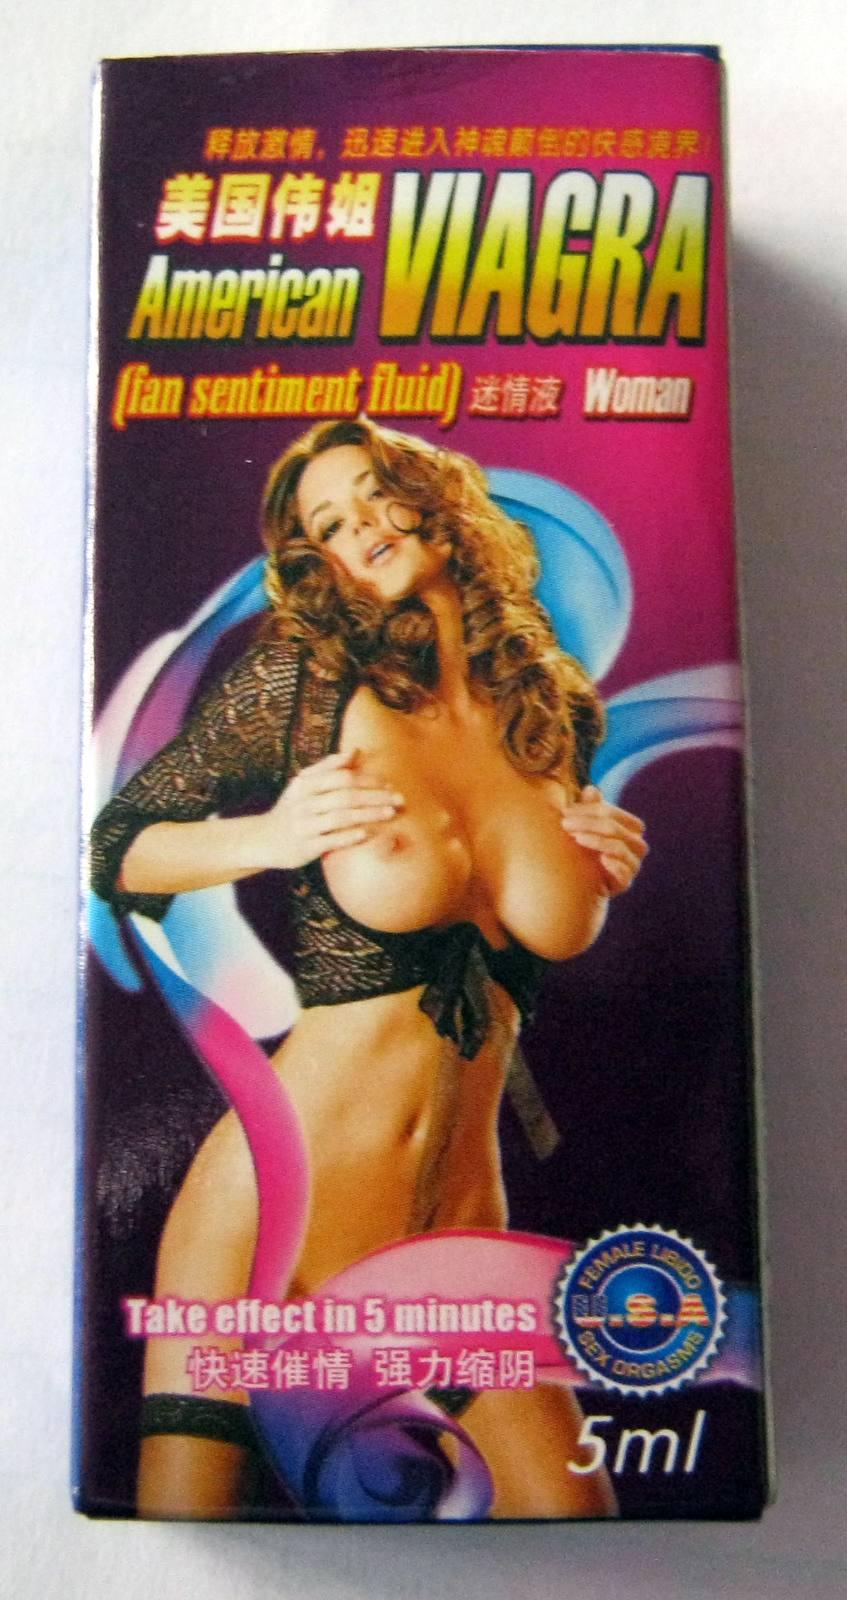 American Viagra -  5ml